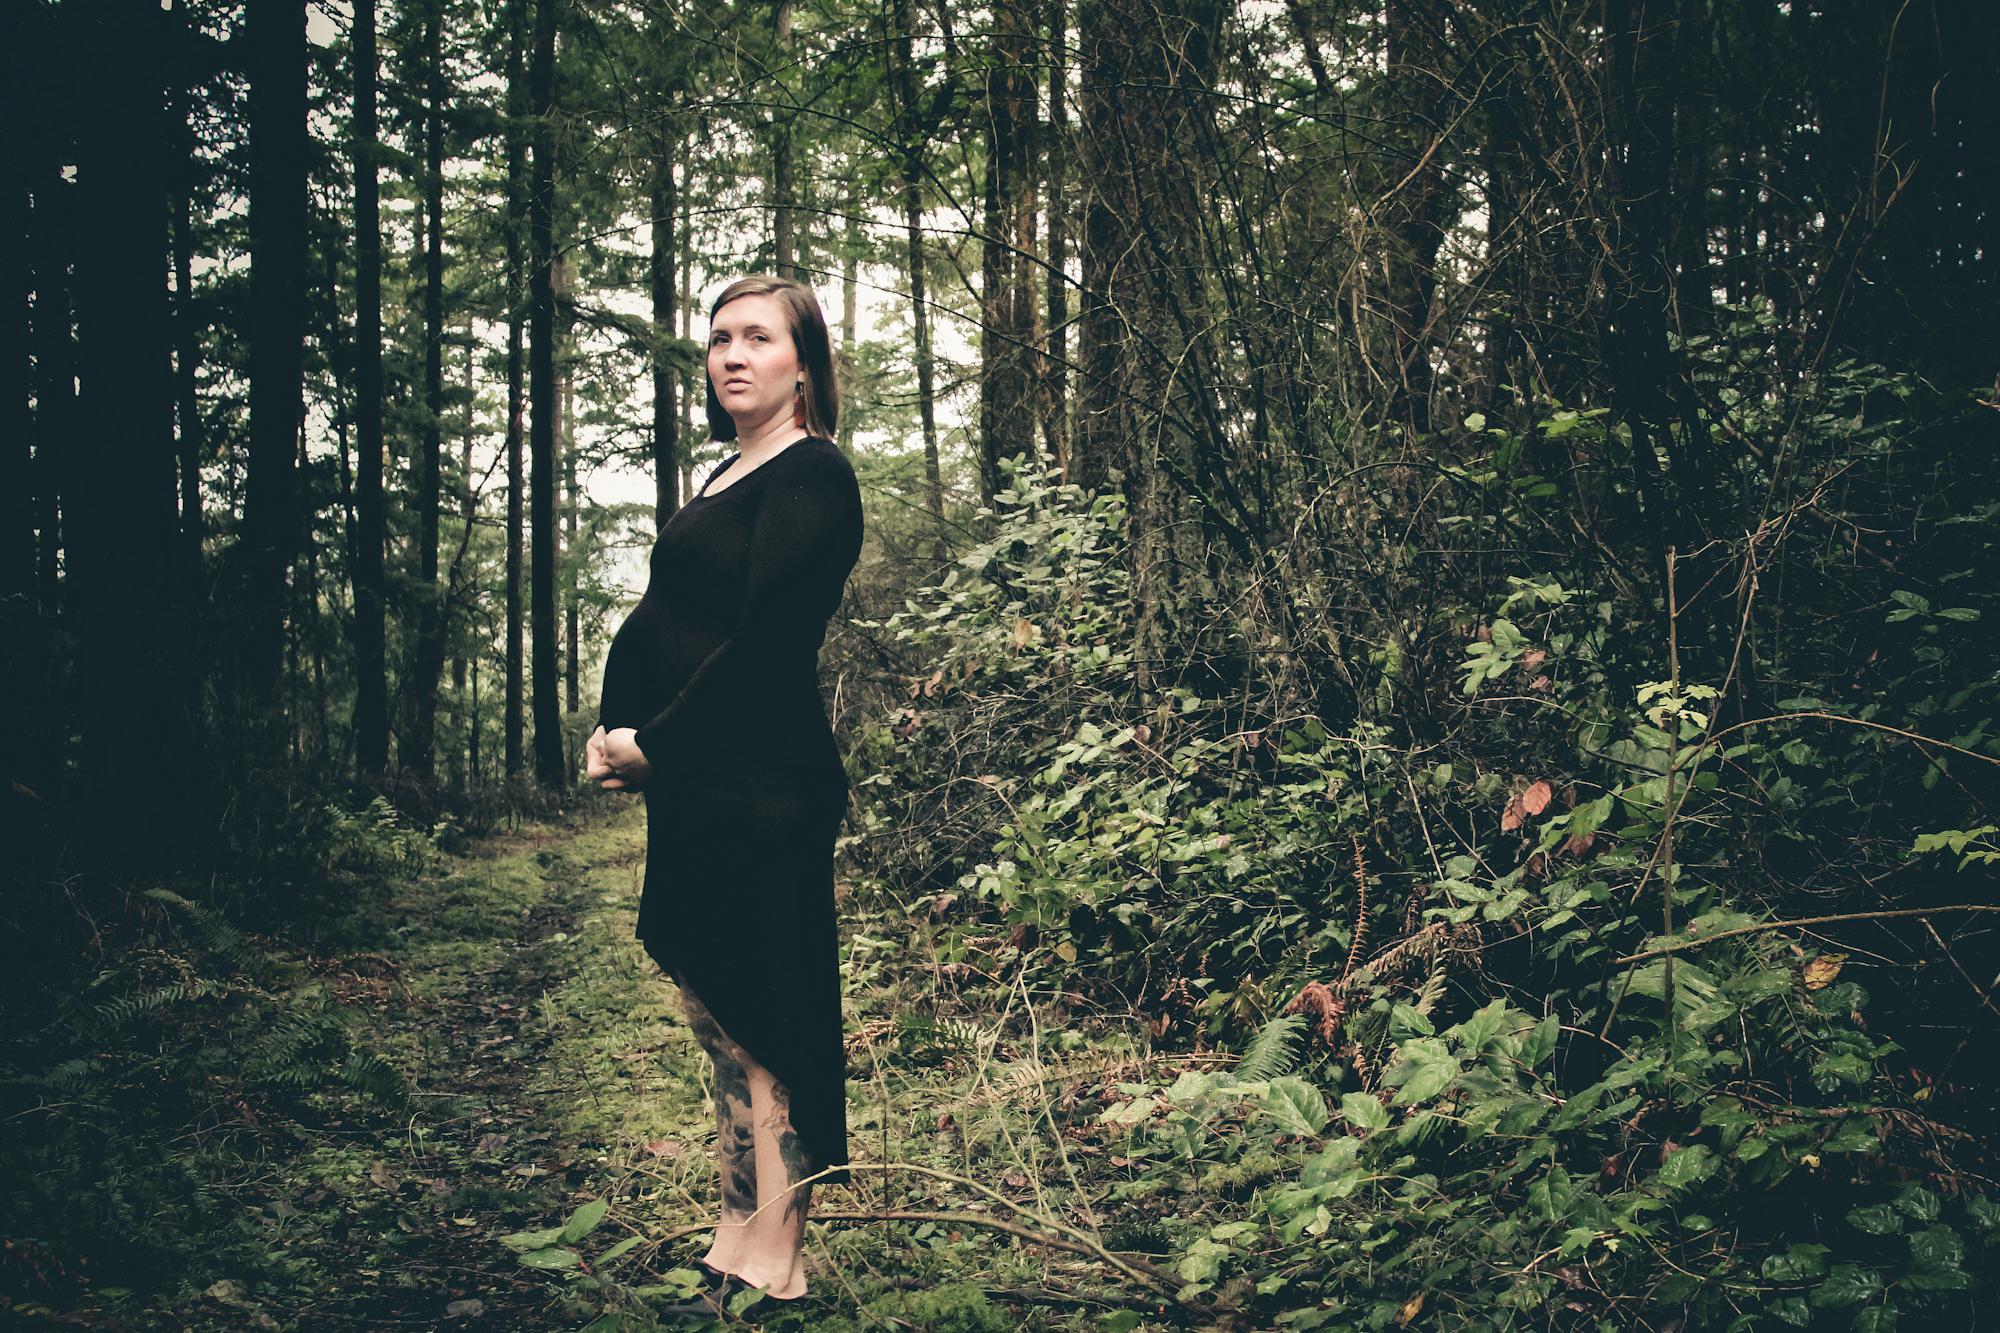 alex_pregnant-1368.jpg